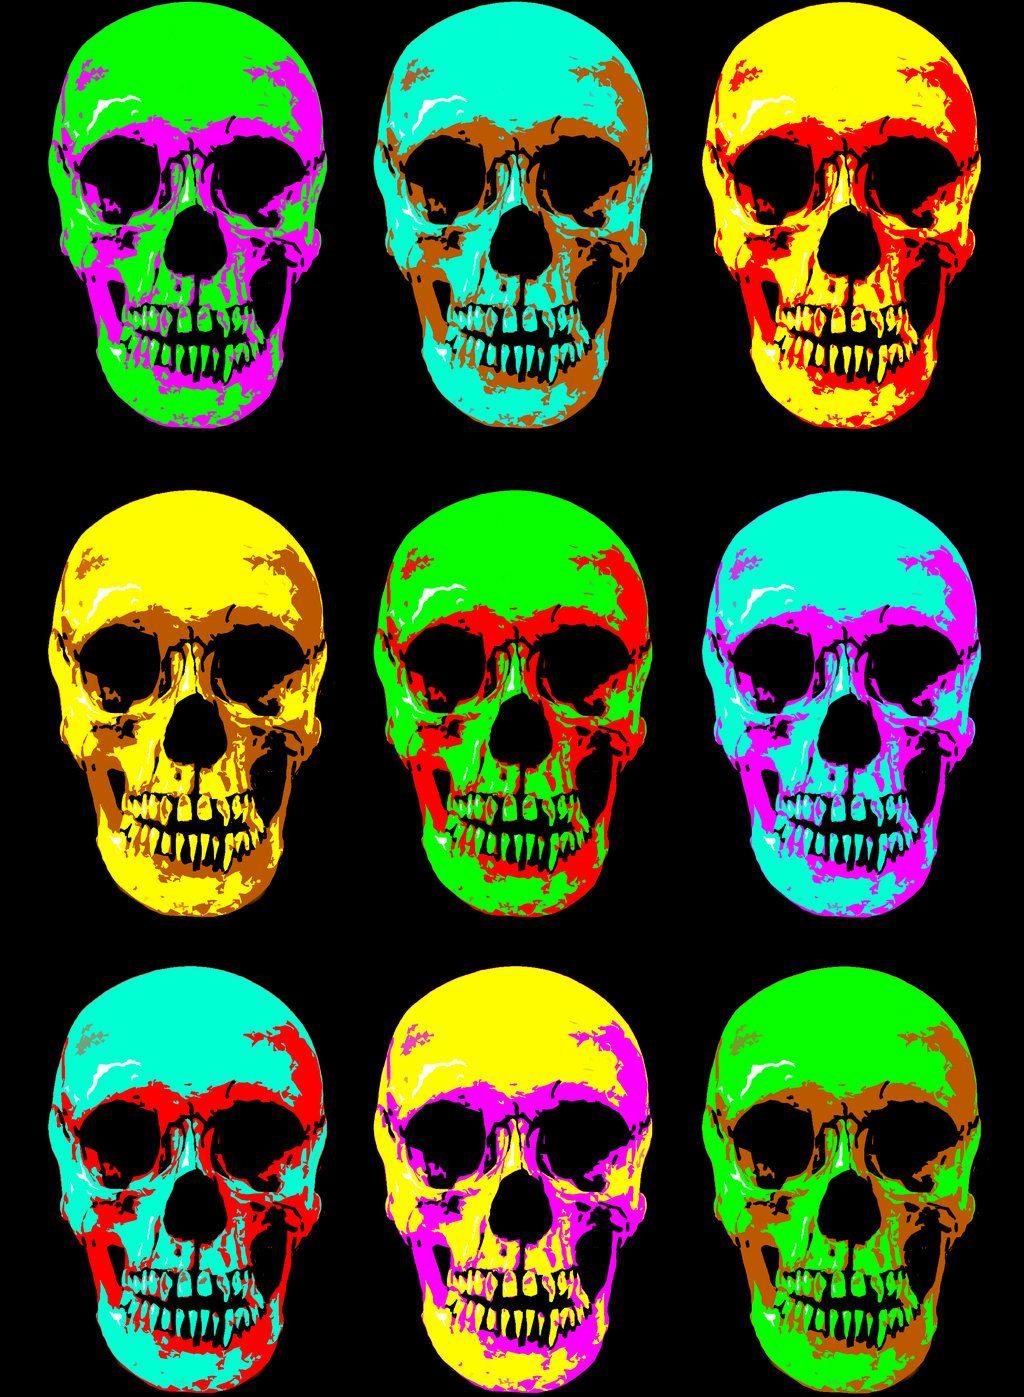 Glow Skulls by NickNightshade on DeviantArt